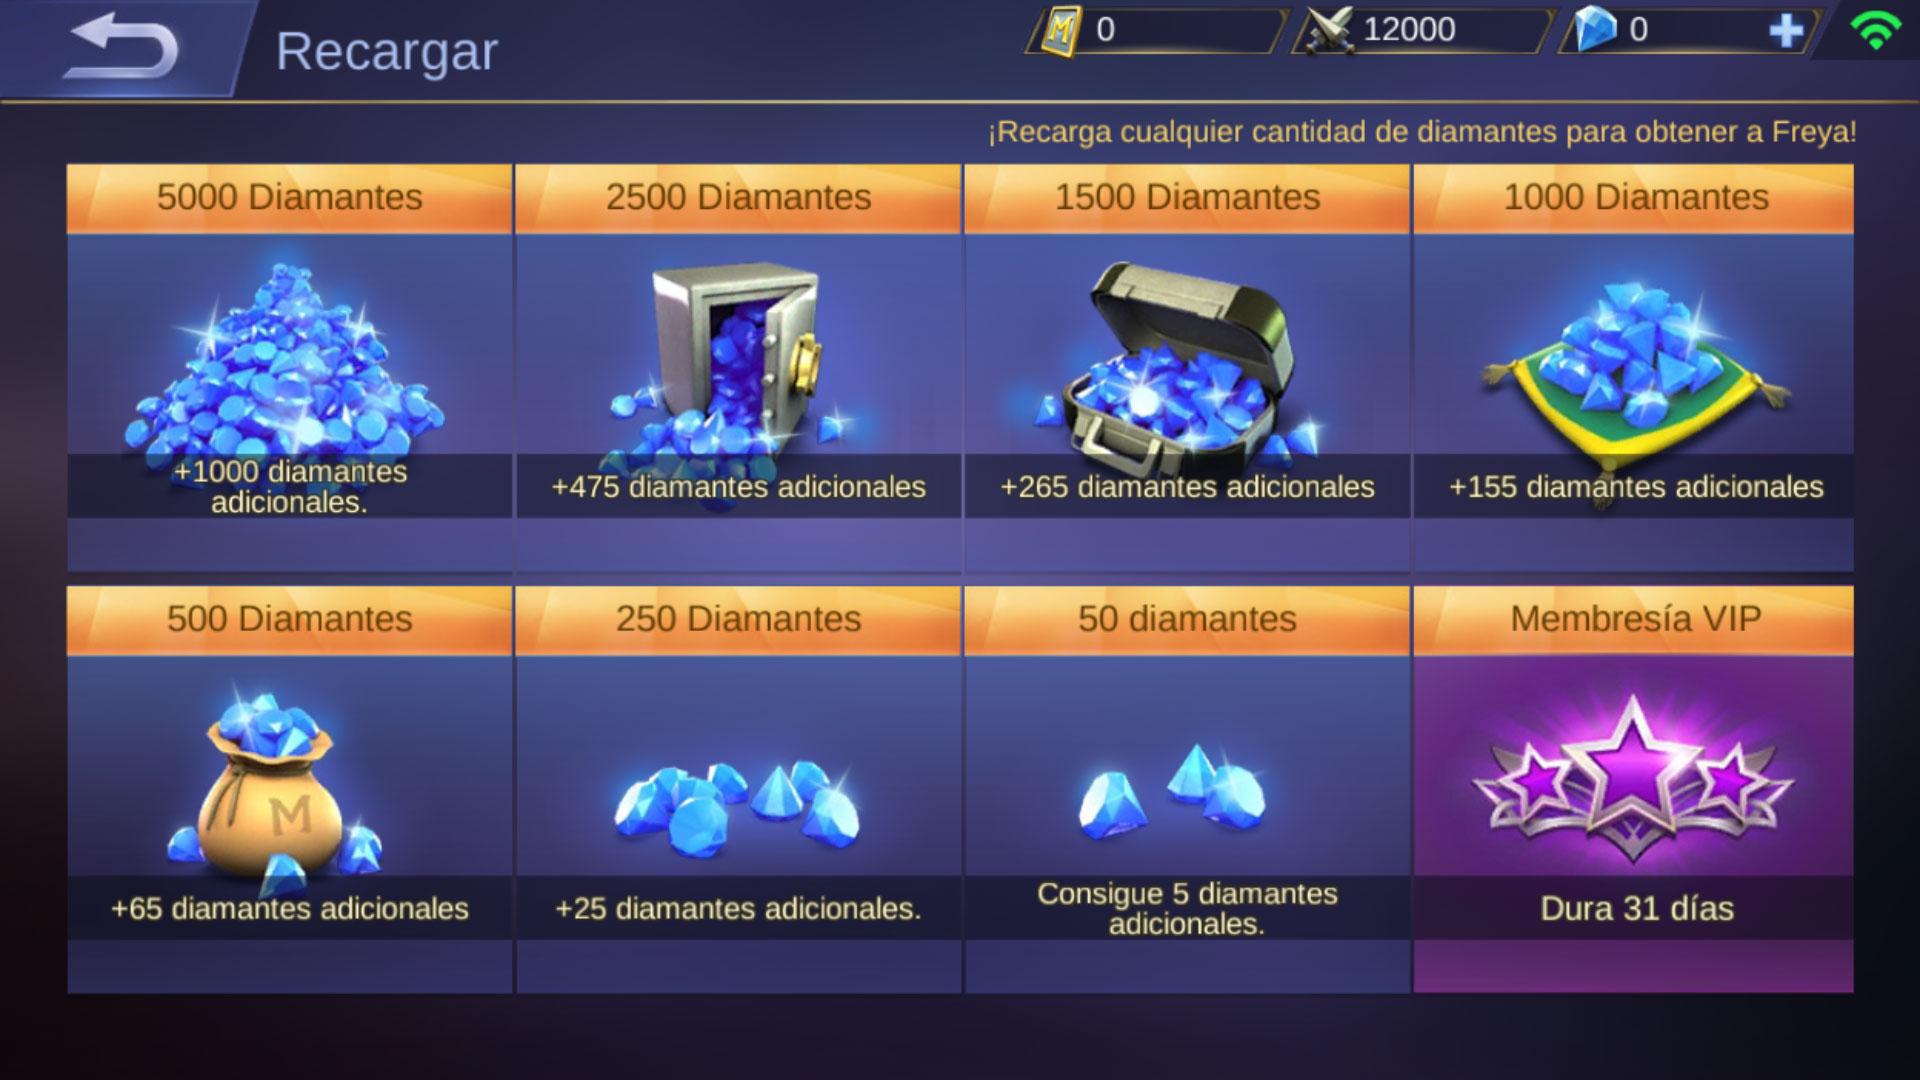 Mobile Legends Diamantes